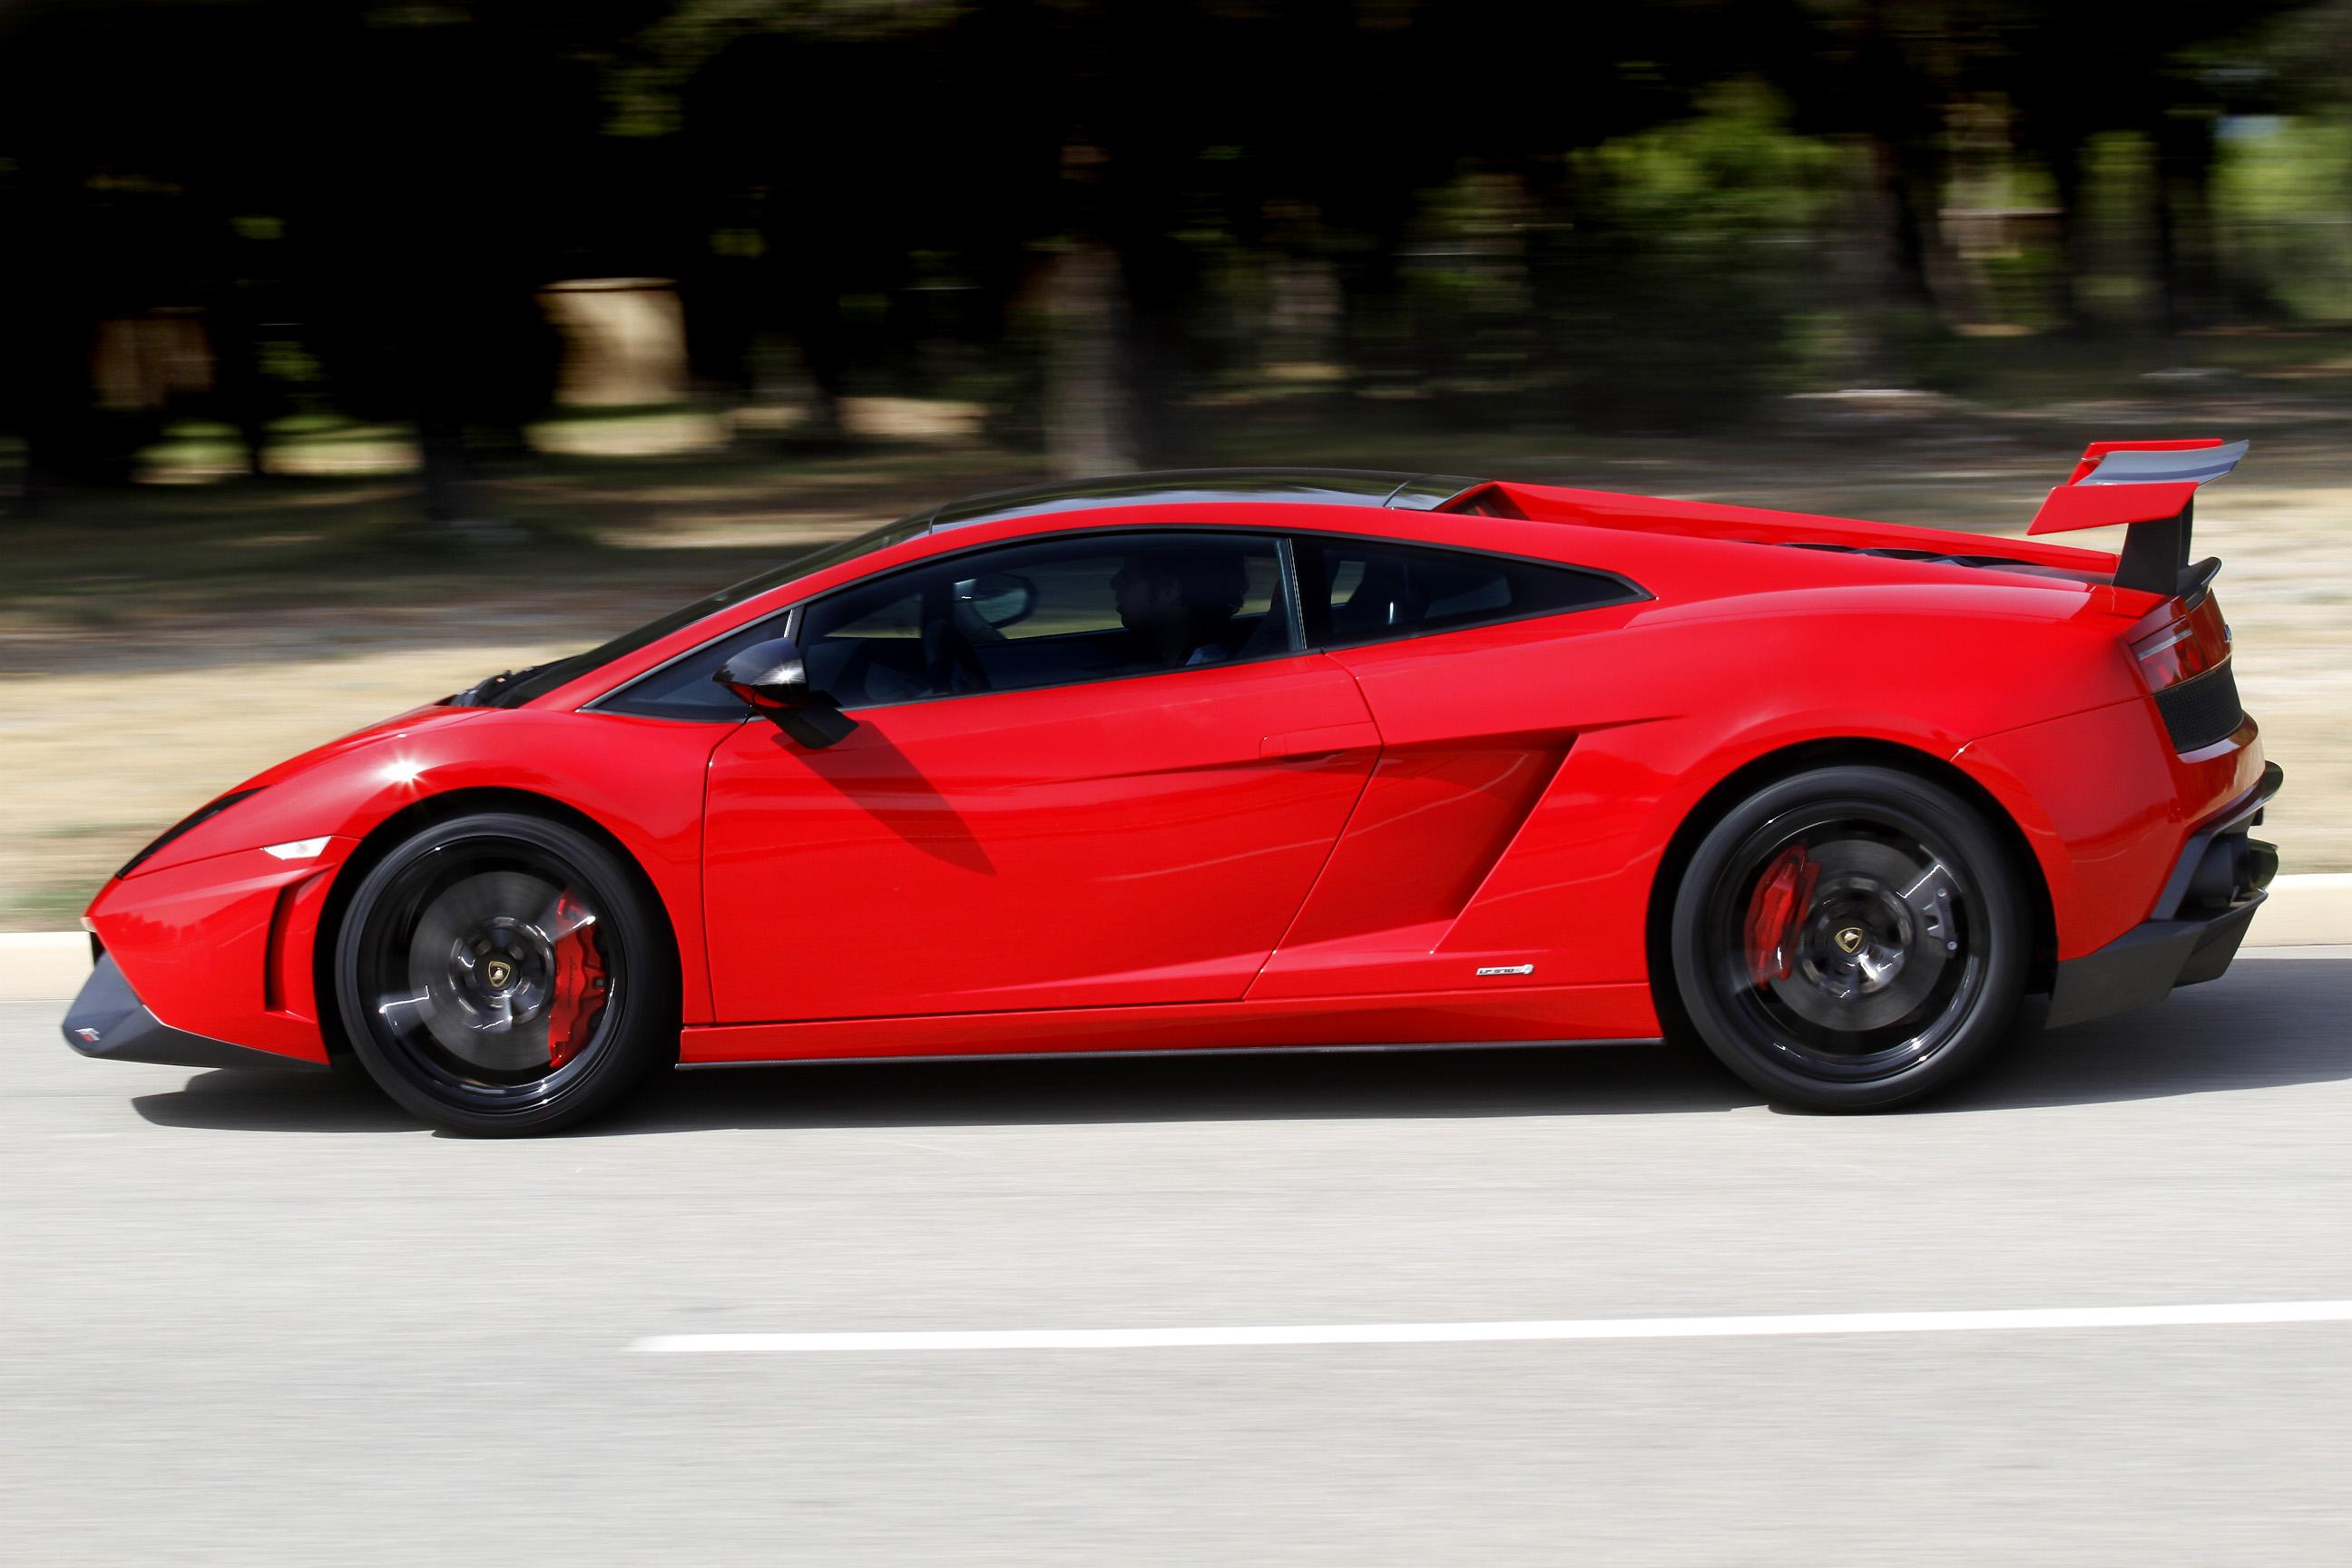 http://images.caradisiac.com/images/9/6/5/3/79653/S0-Prise-en-mains-Lamborghini-Gallardo-Super-Trofeo-Stradale-la-sortie-de-piste-266880.jpg